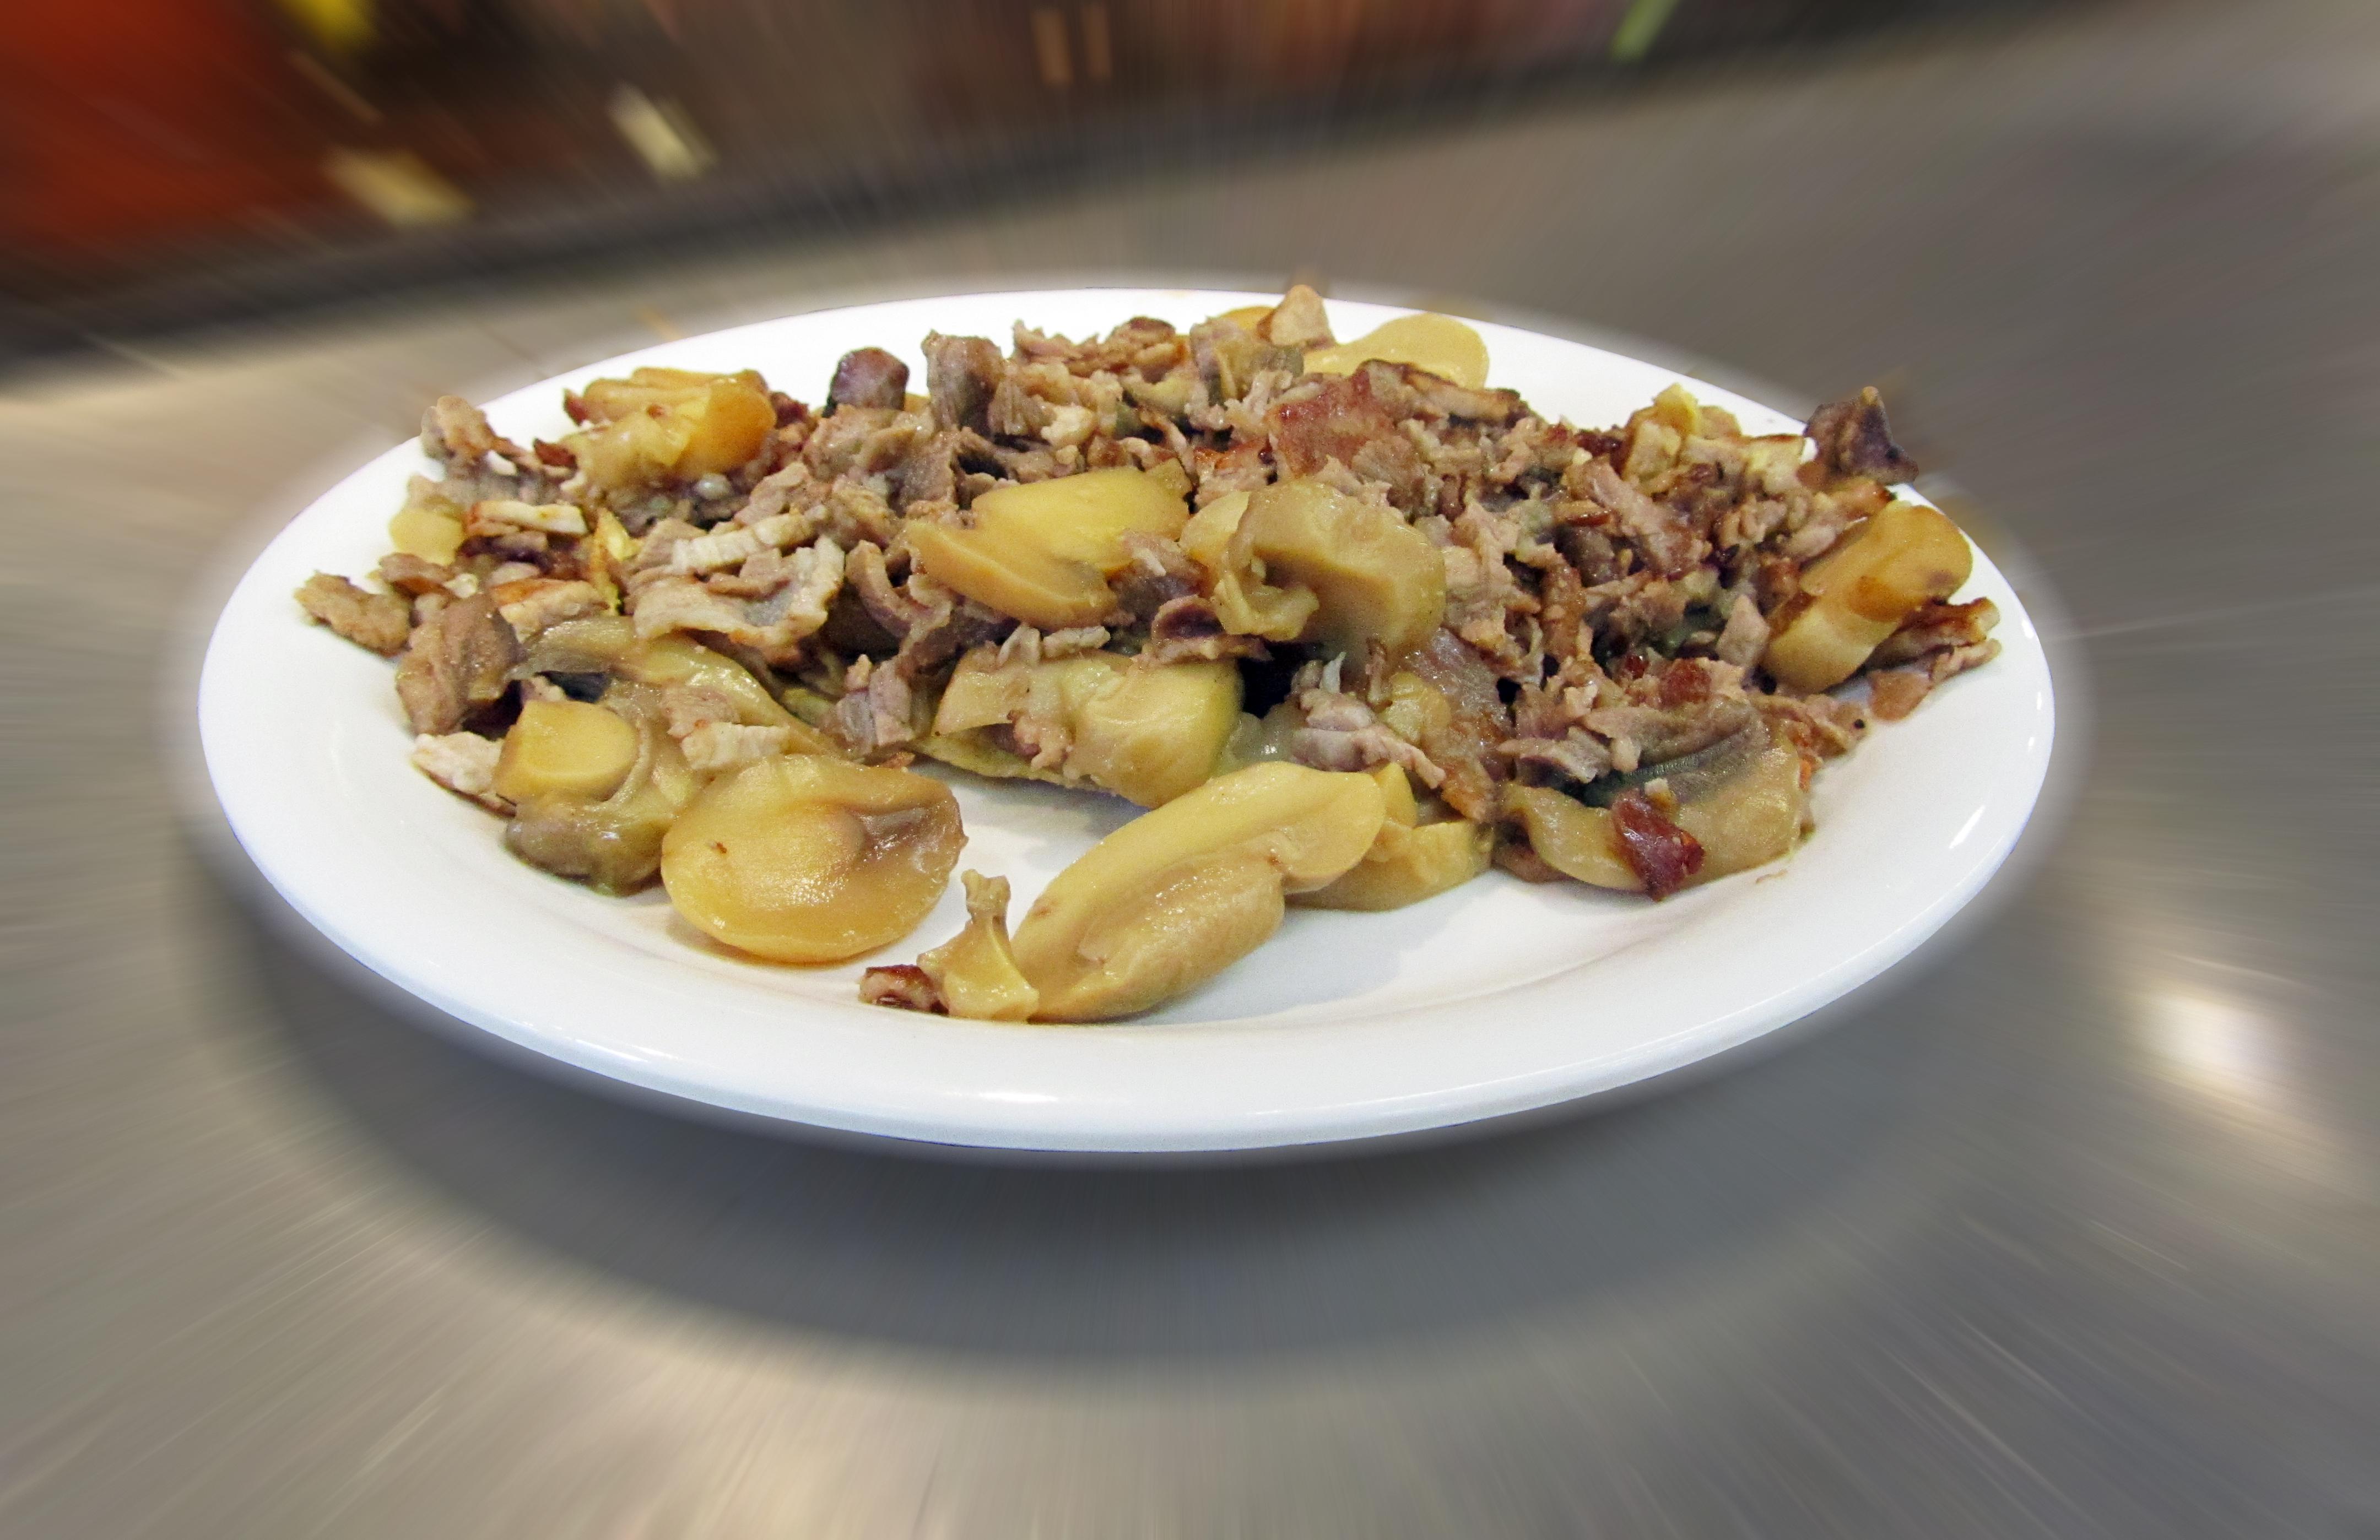 Beef  whit mushrooms